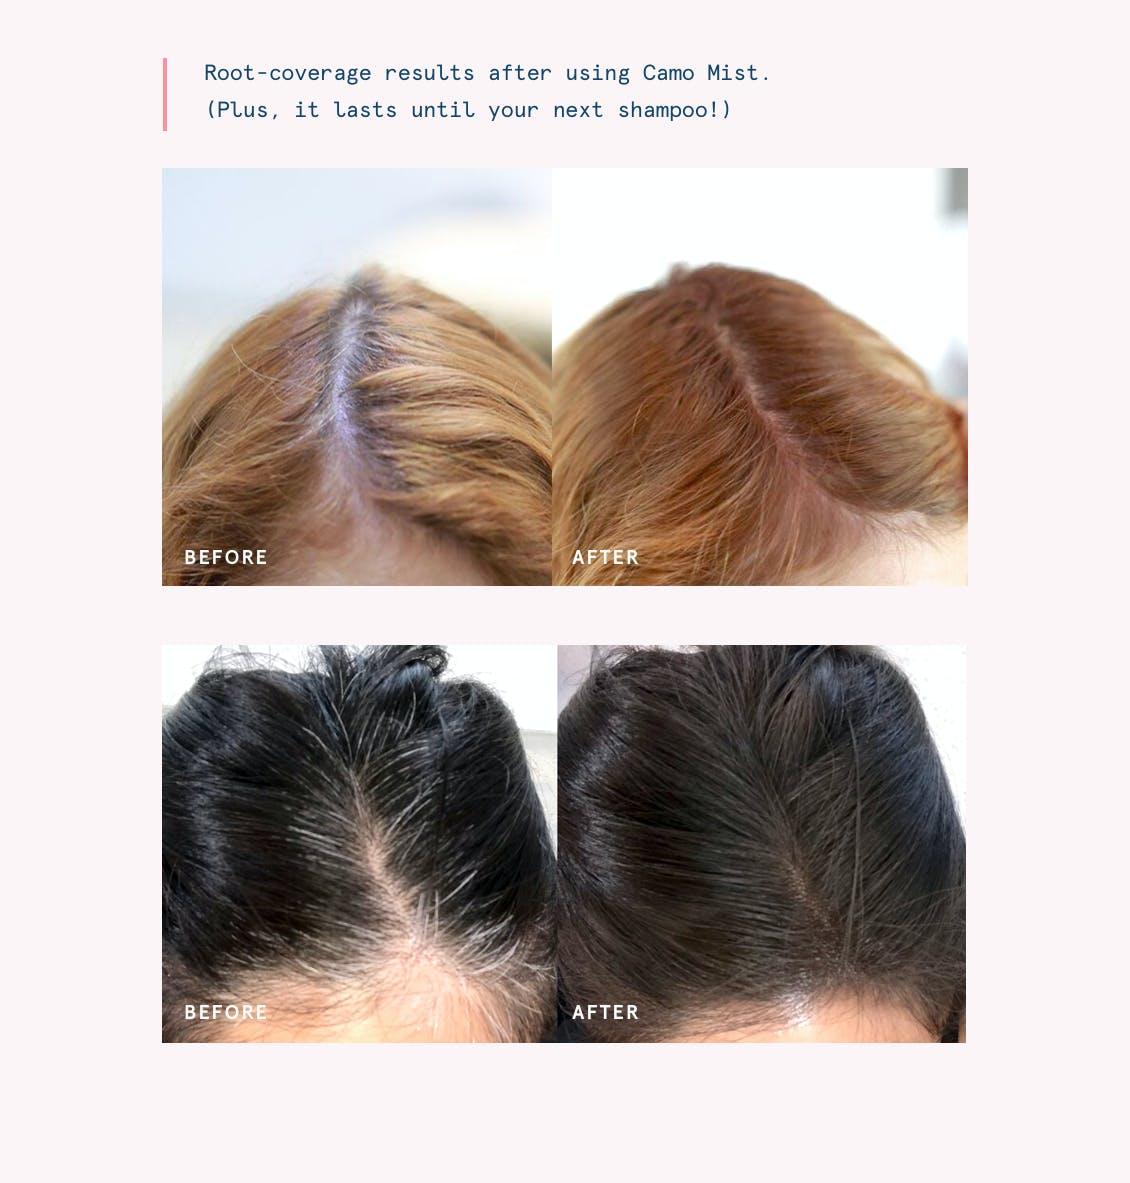 5 Ways To Conceal Pesky Grays Between Hair Color Applications